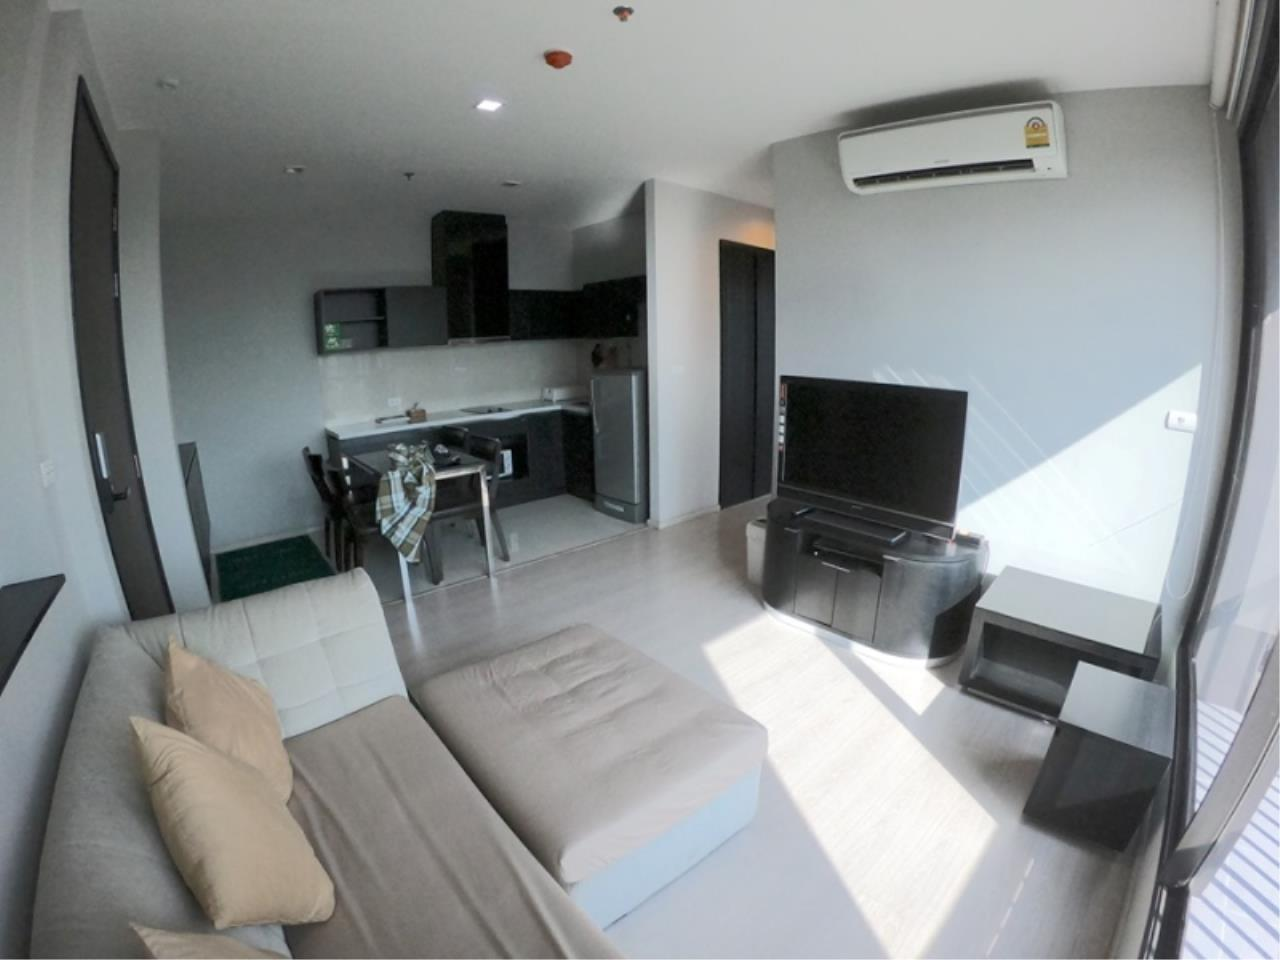 Century21 Skylux Agency's Rhythm Sukhumvit 44/1 / Condo For Sale / 2 Bedroom / 52.2 SQM / BTS Phra Khanong / Bangkok 3